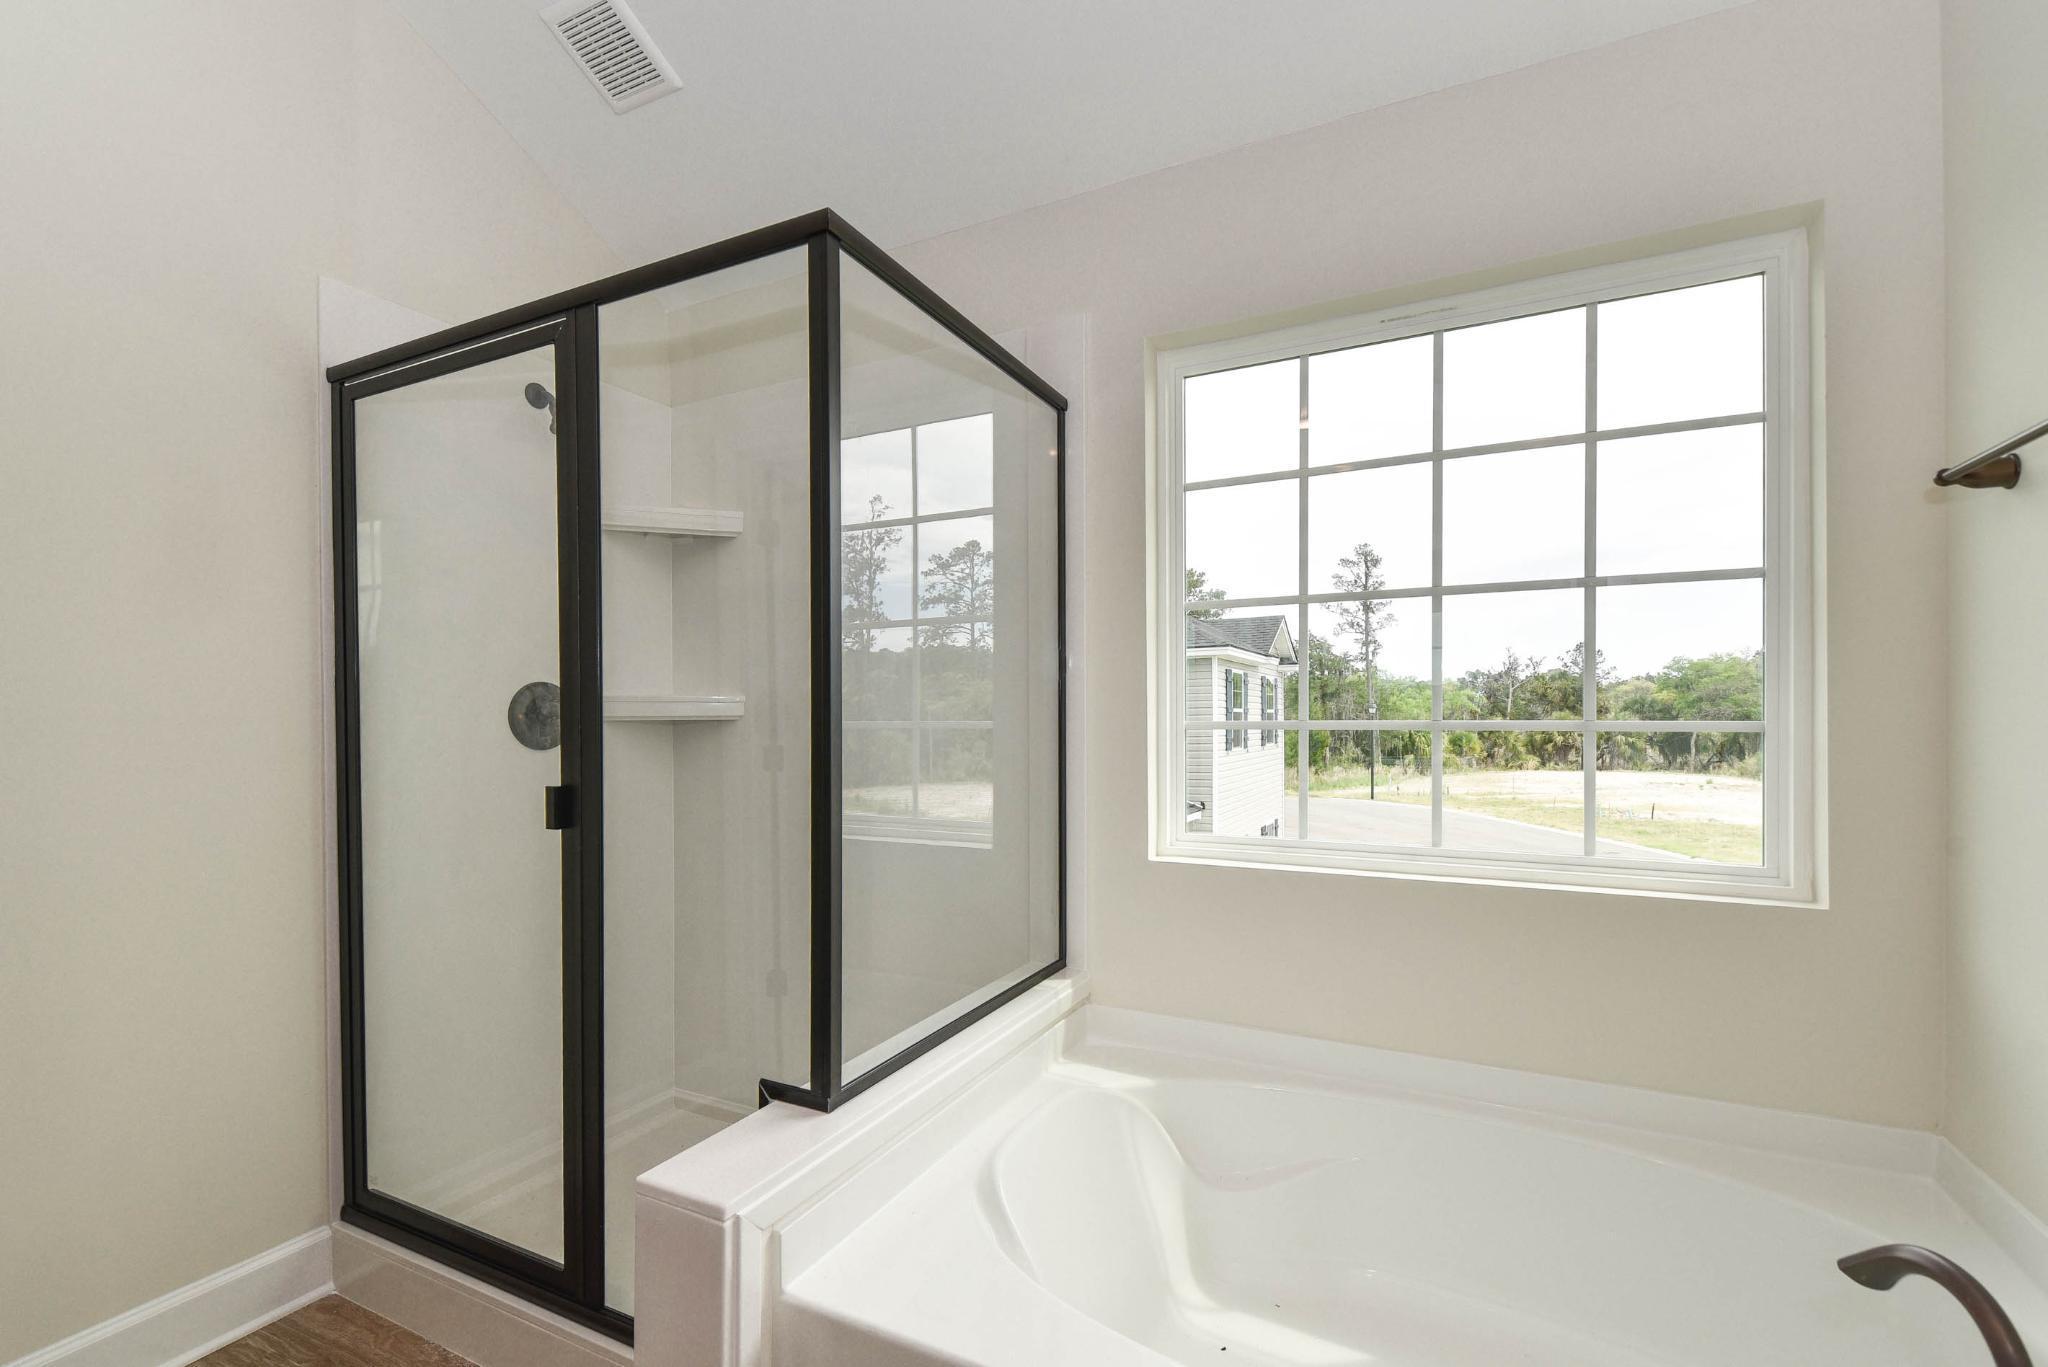 Bathroom featured in the Edisto By Ernest Homes in Savannah, GA